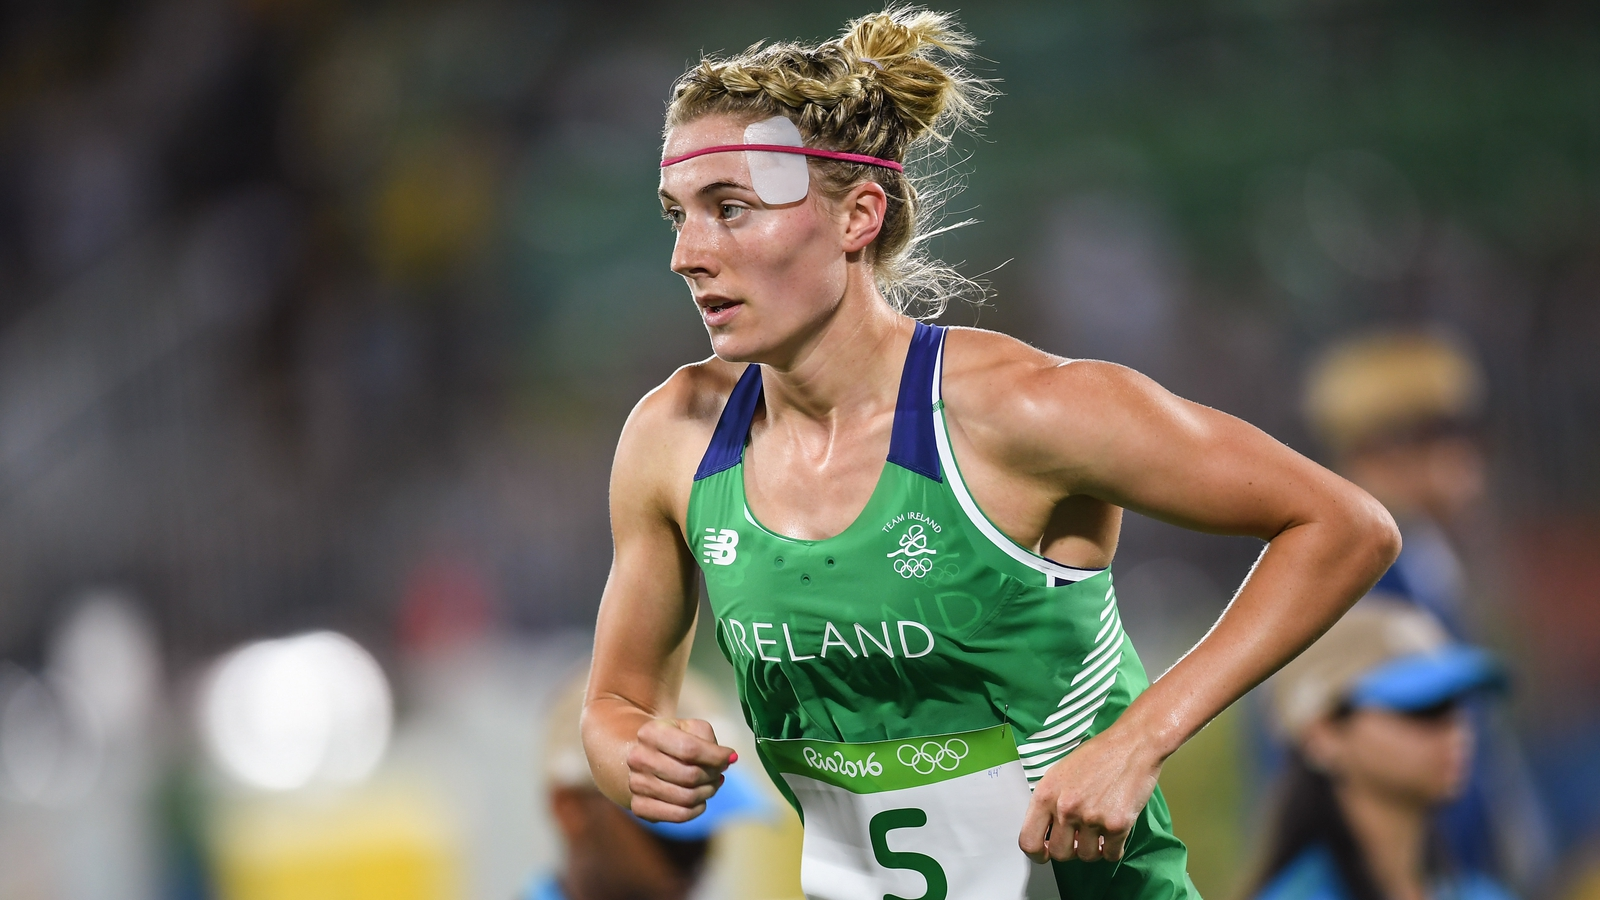 Impressive finish for Coyle in Pentathlon World Cup